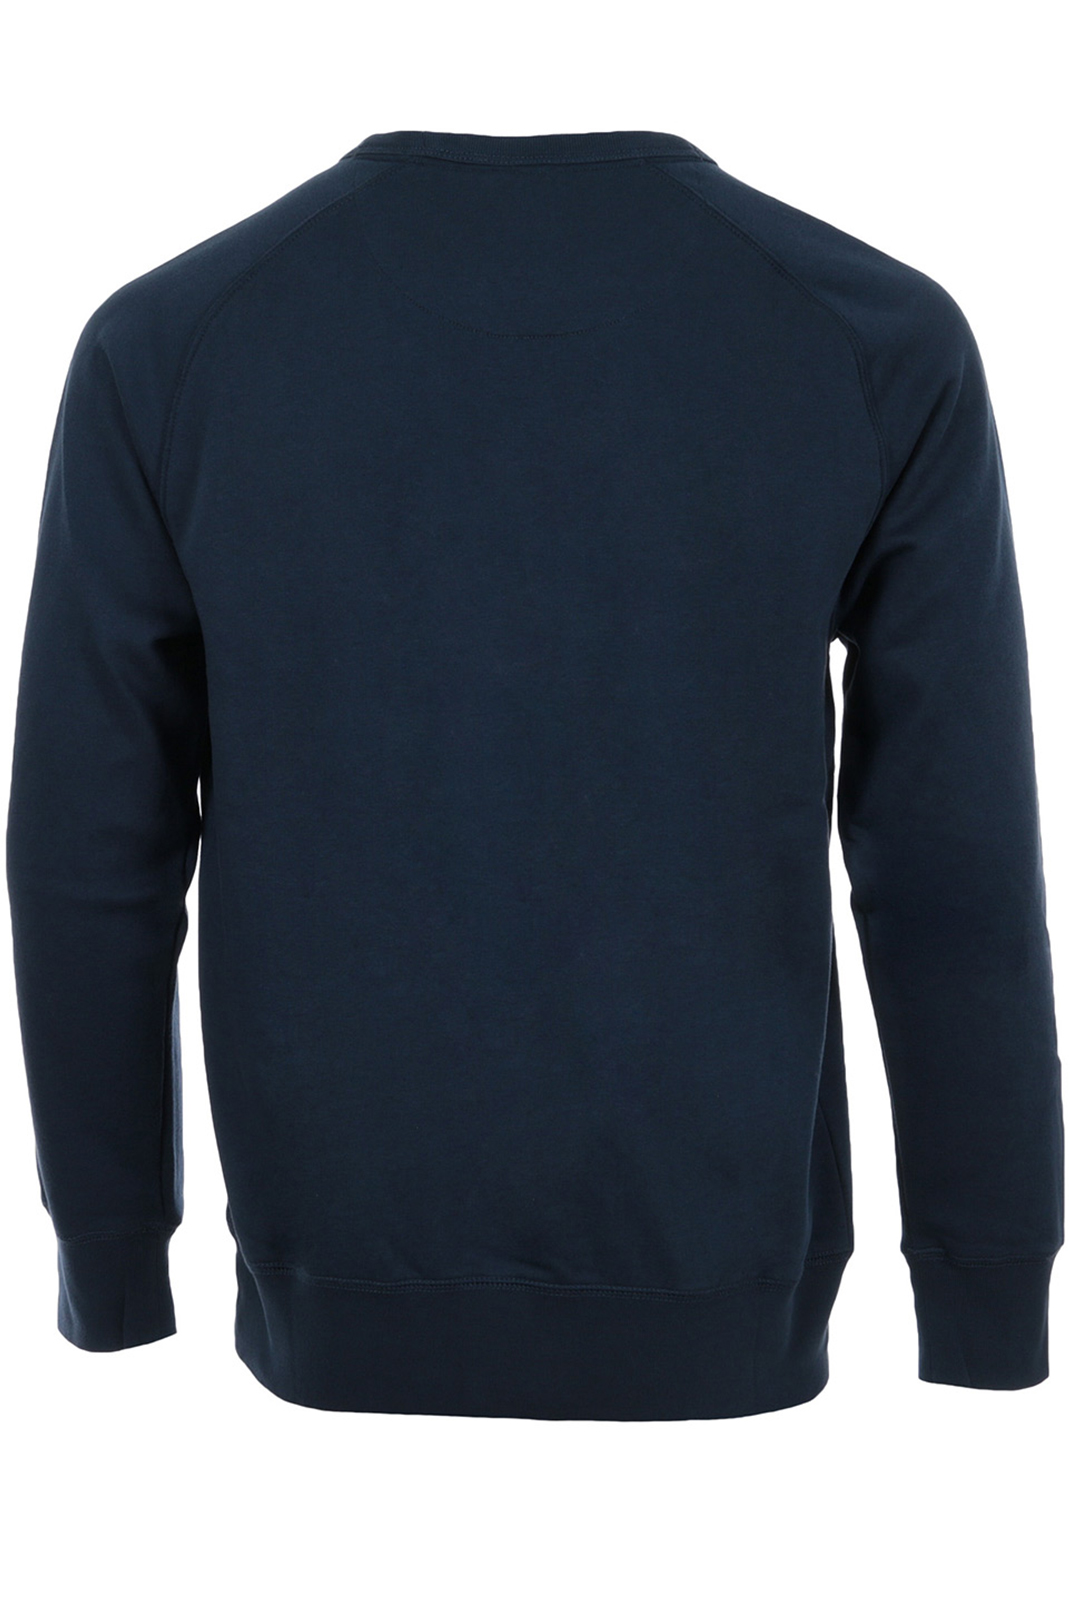 Sweatshirts  Ellesse EH H CREW NECK UNI NAVY